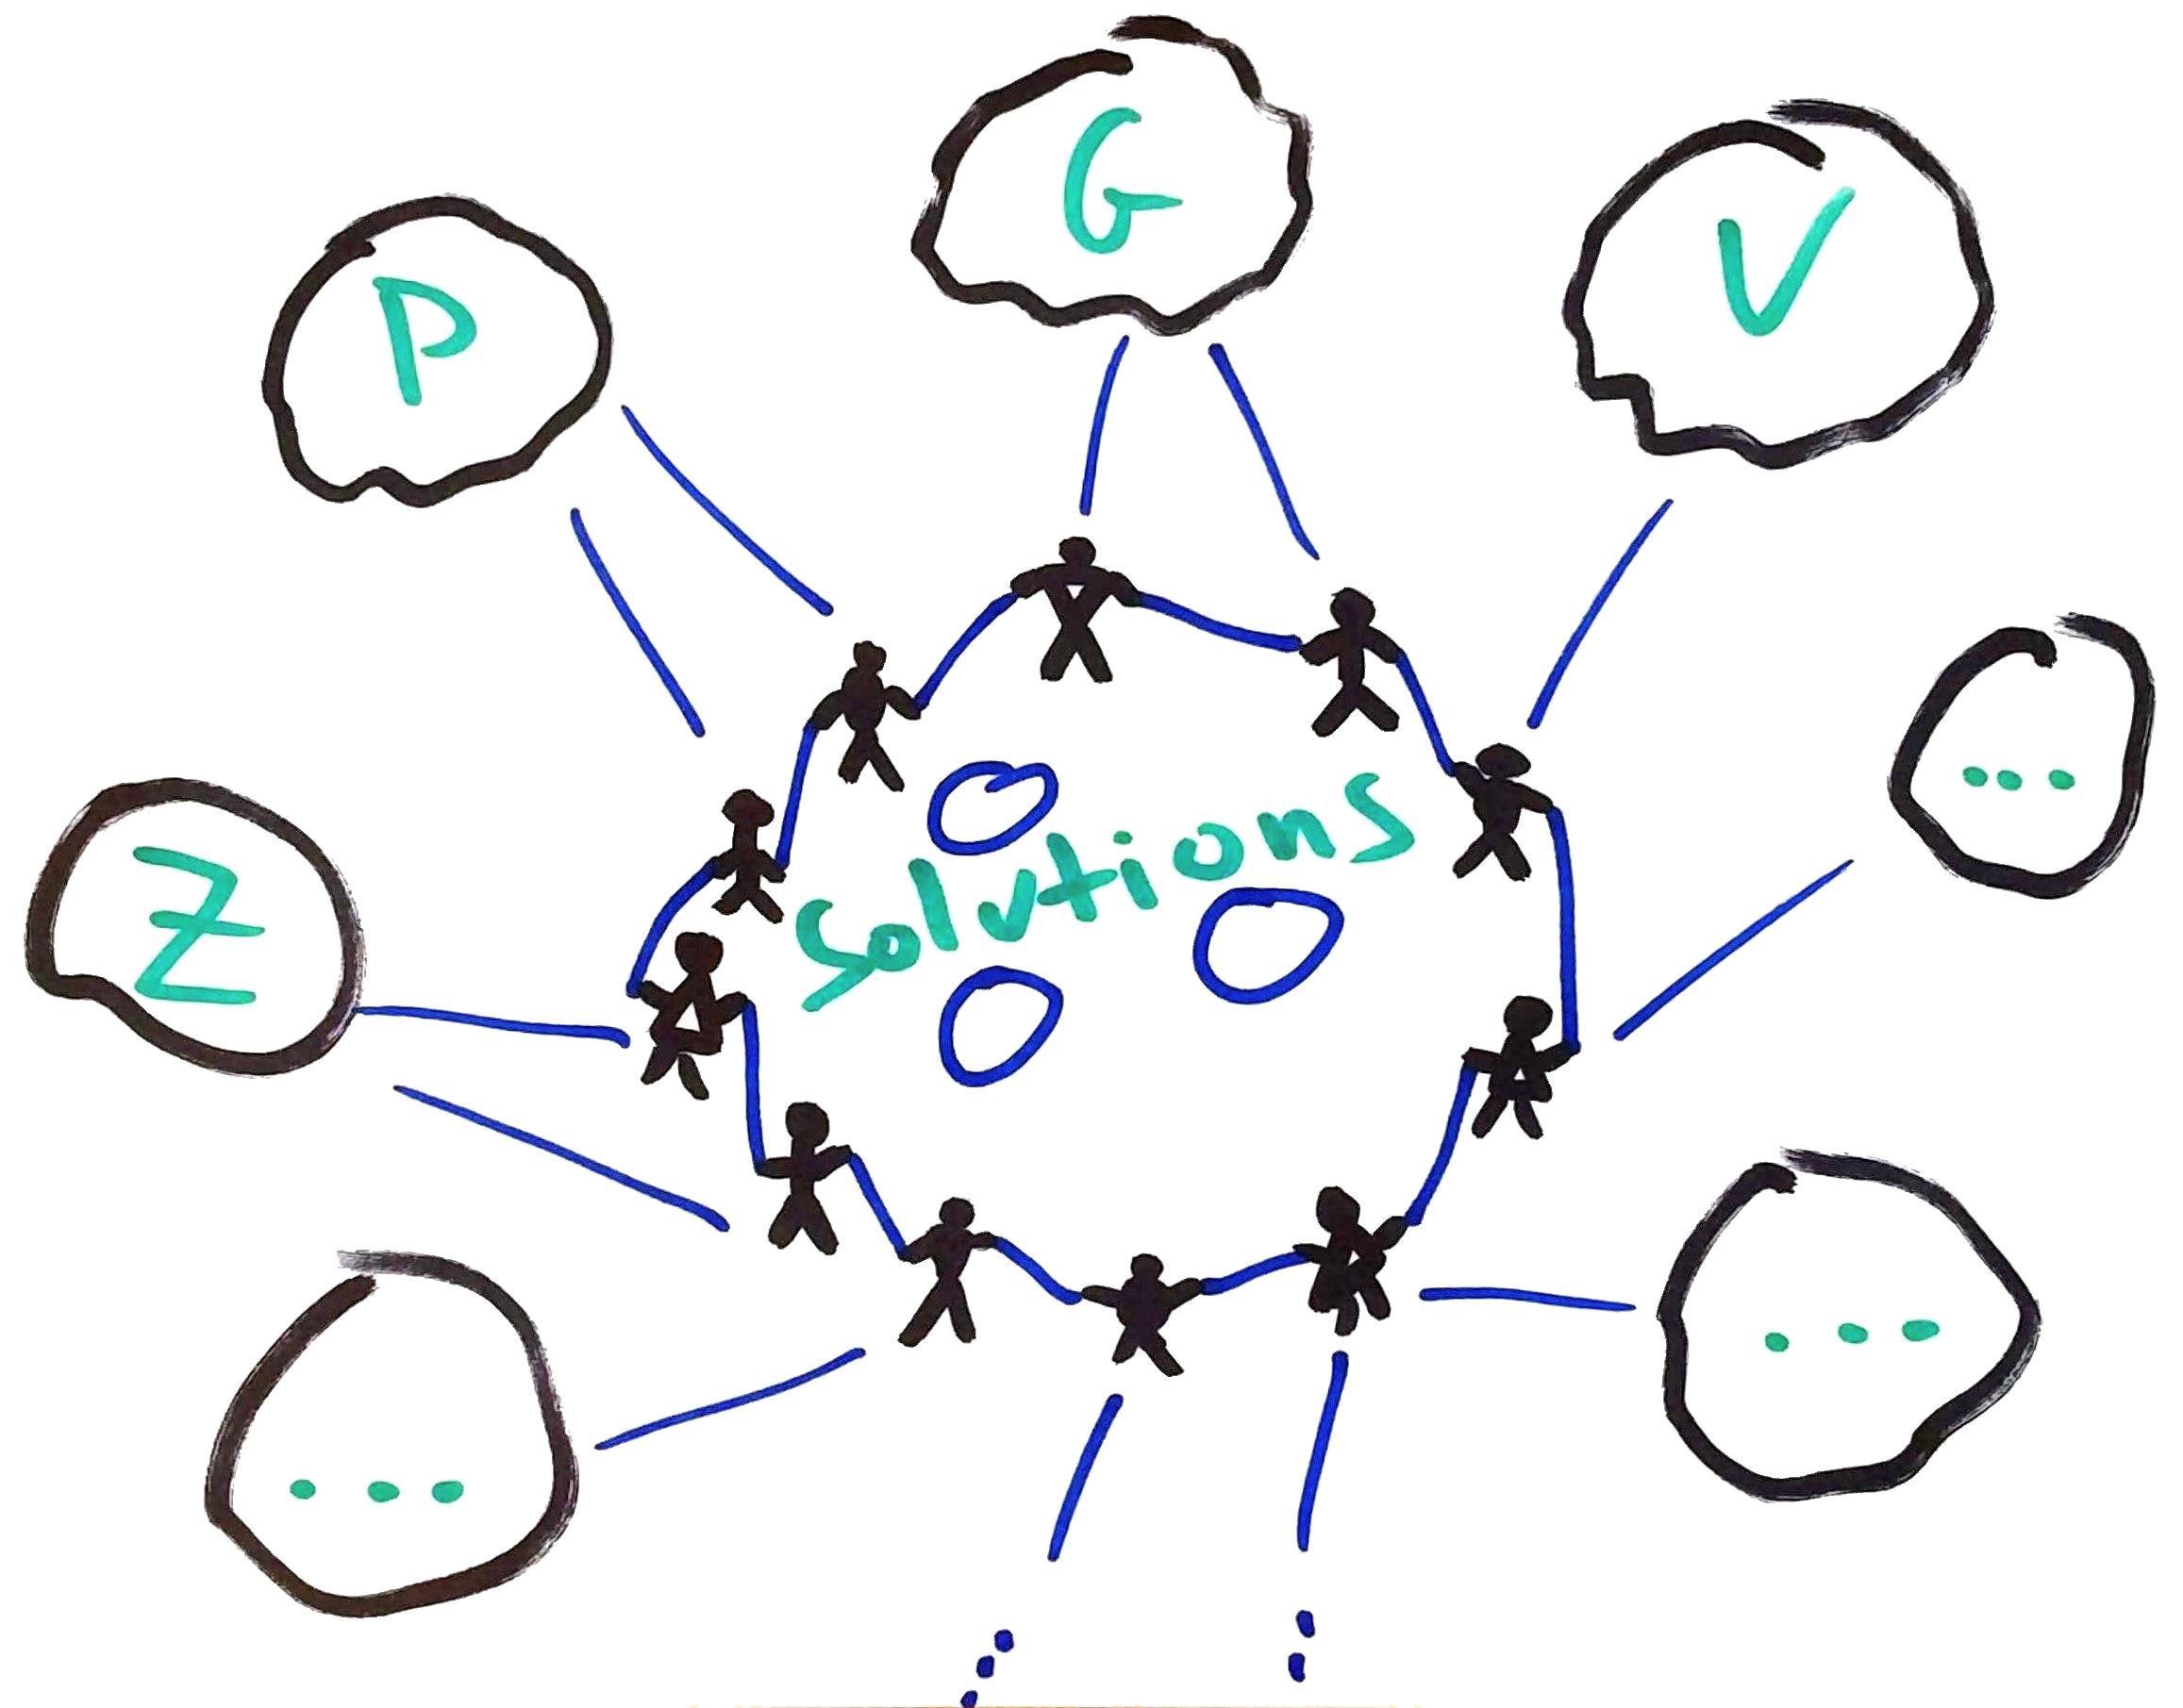 Sketch Art: Plone Governance Process Circle